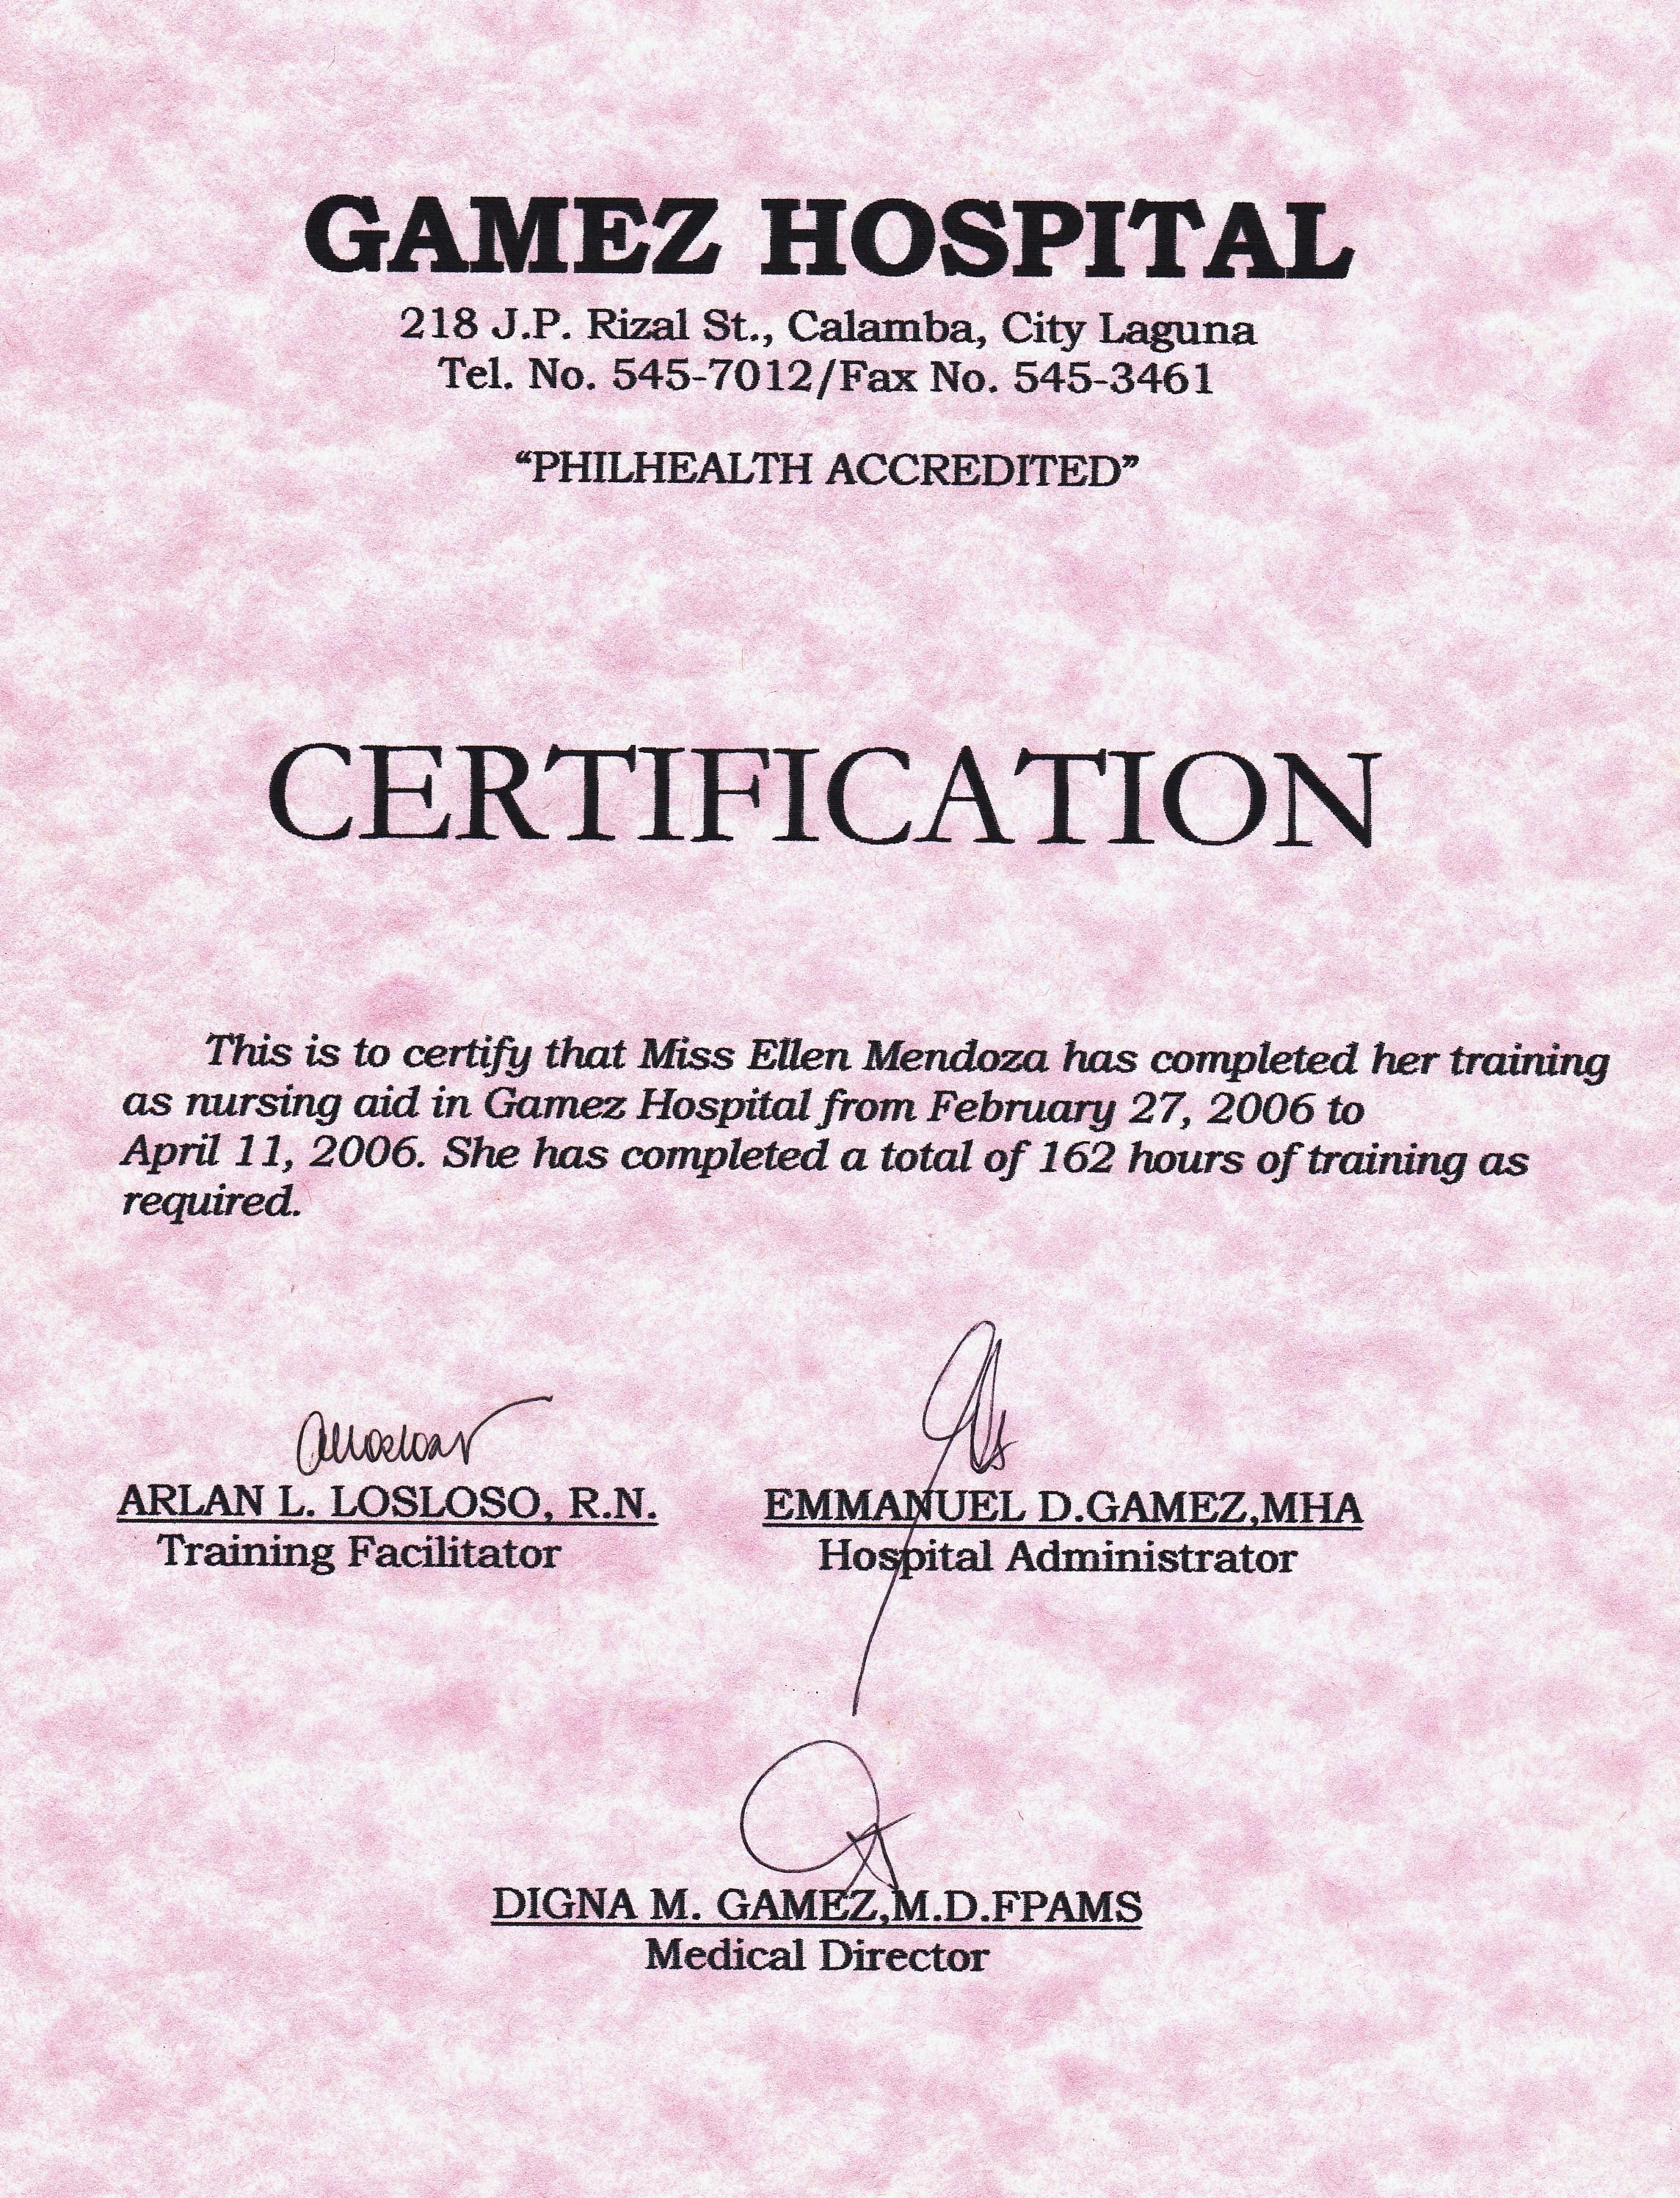 Certificate of employment for nurses guest card template 5126 77553850424 file 0003jpg 5126 77553850424 file 0003 liveinnannyaspid5126 certificate of employment for nurses certificate of employment for nurses yadclub Gallery